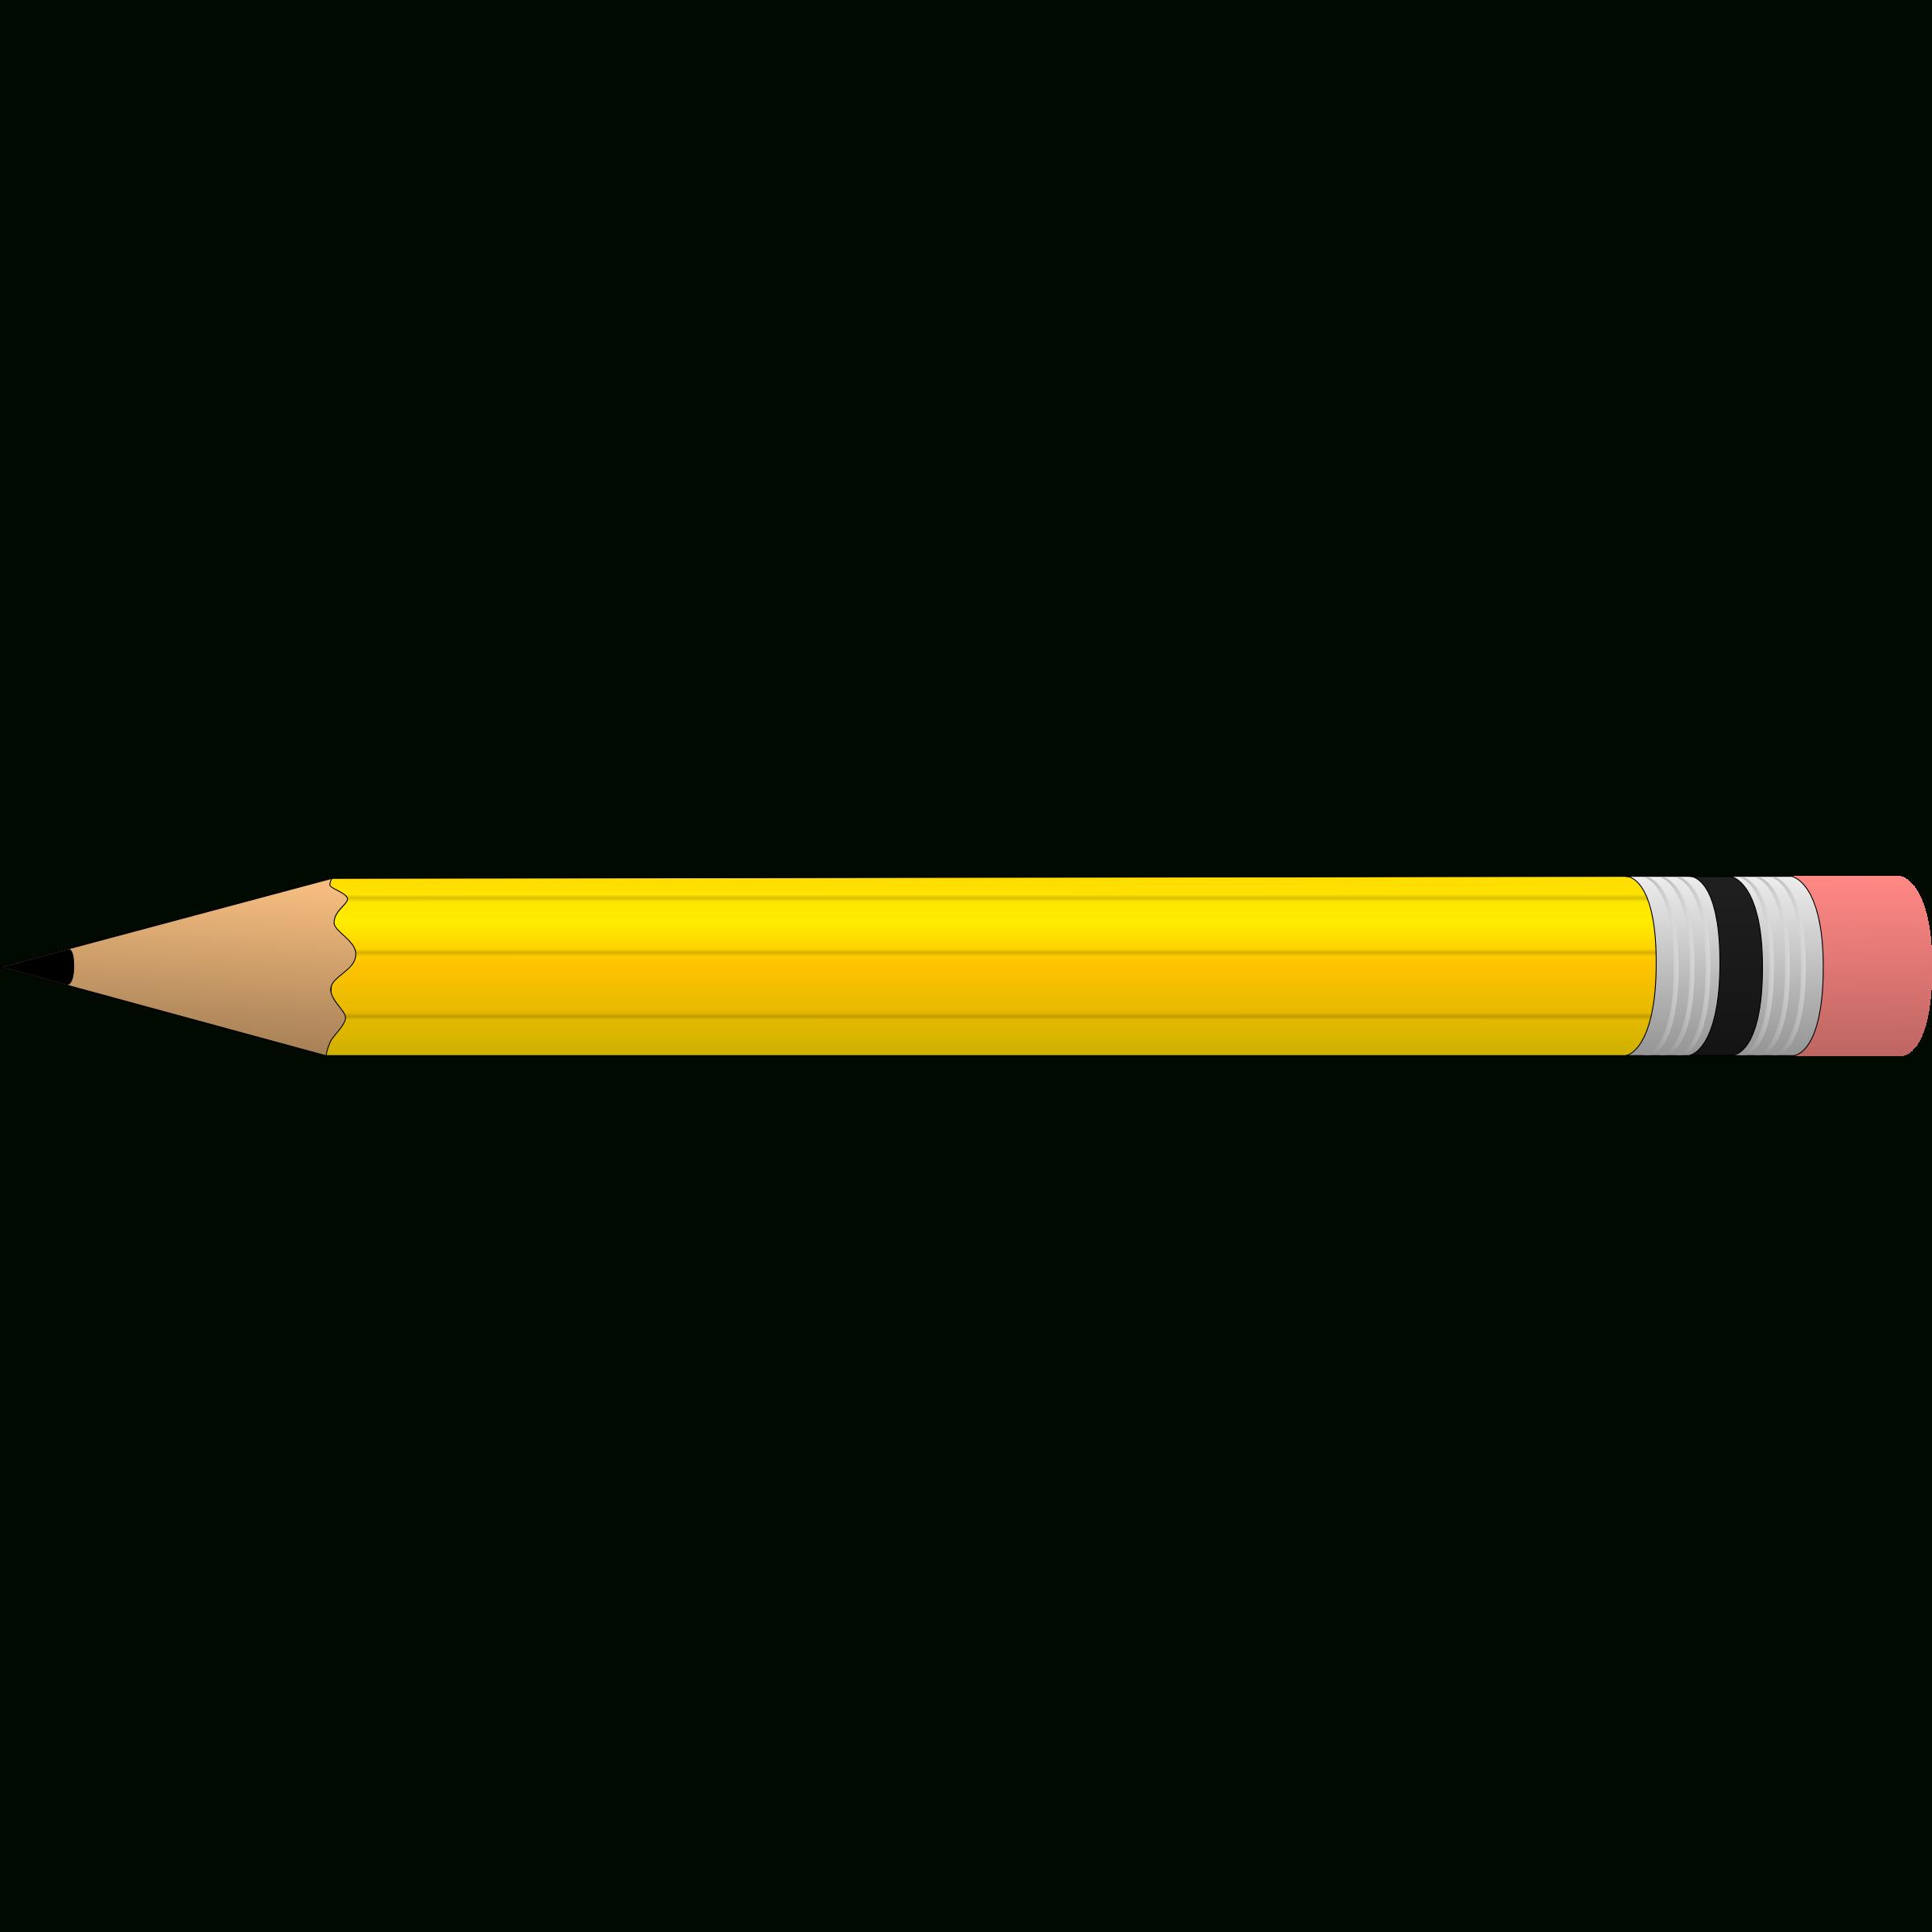 Pen clipart horizontal, Pen horizontal Transparent FREE for.